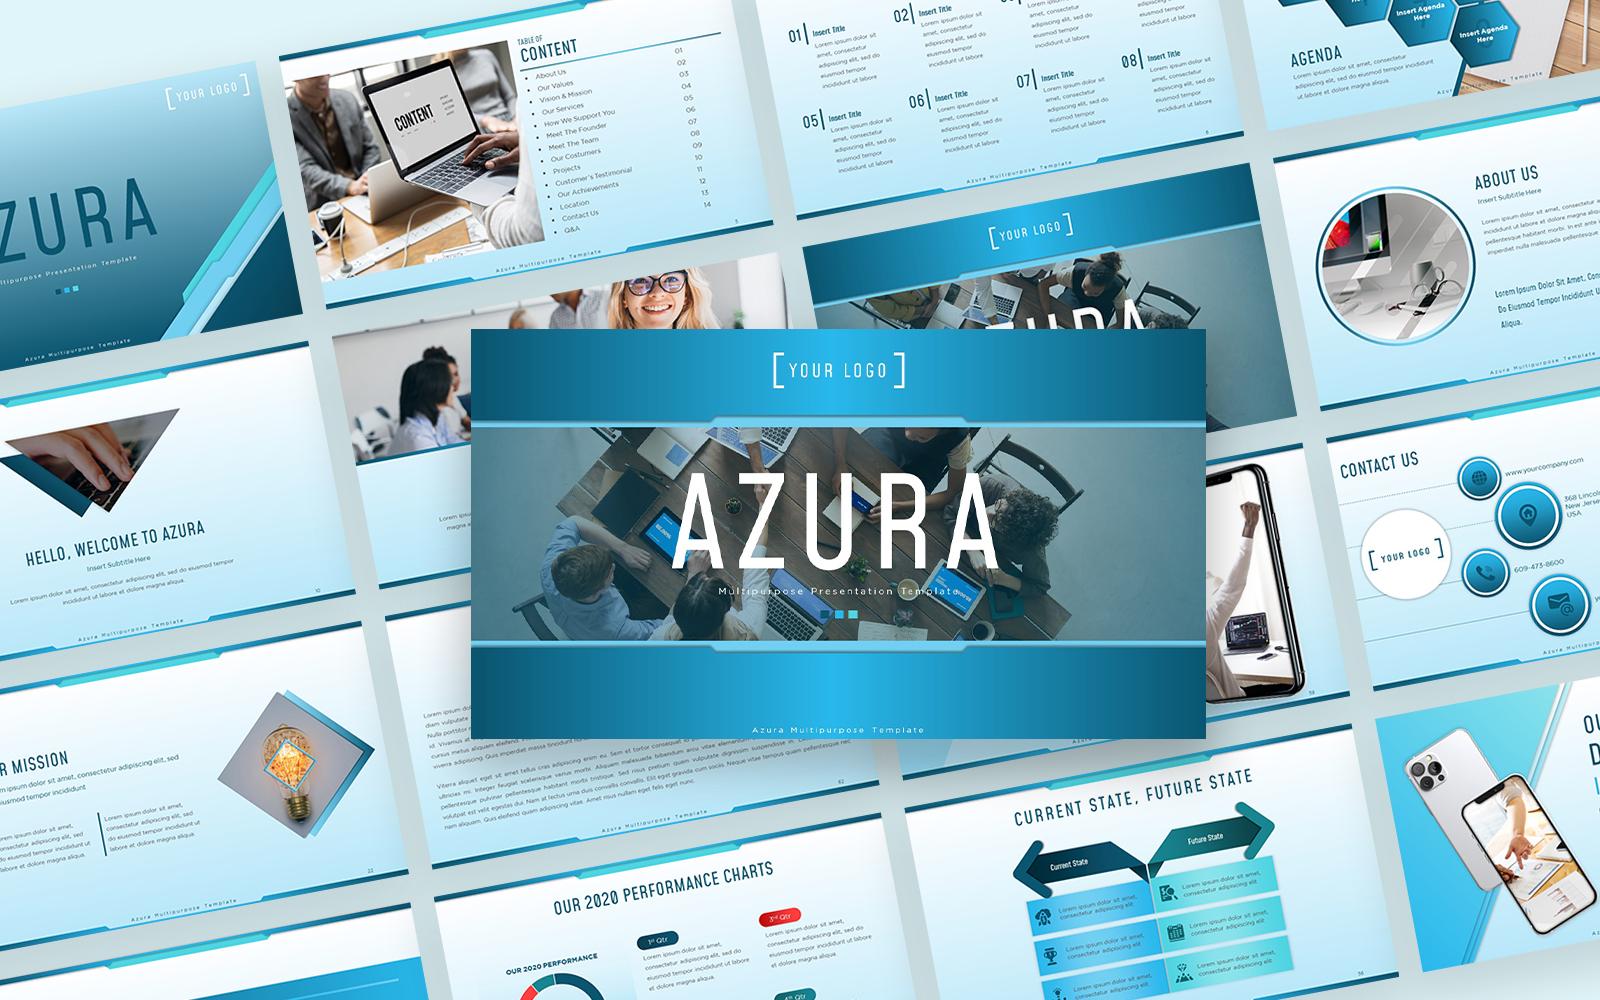 Azura Multipurpose Presentation PowerPoint Template